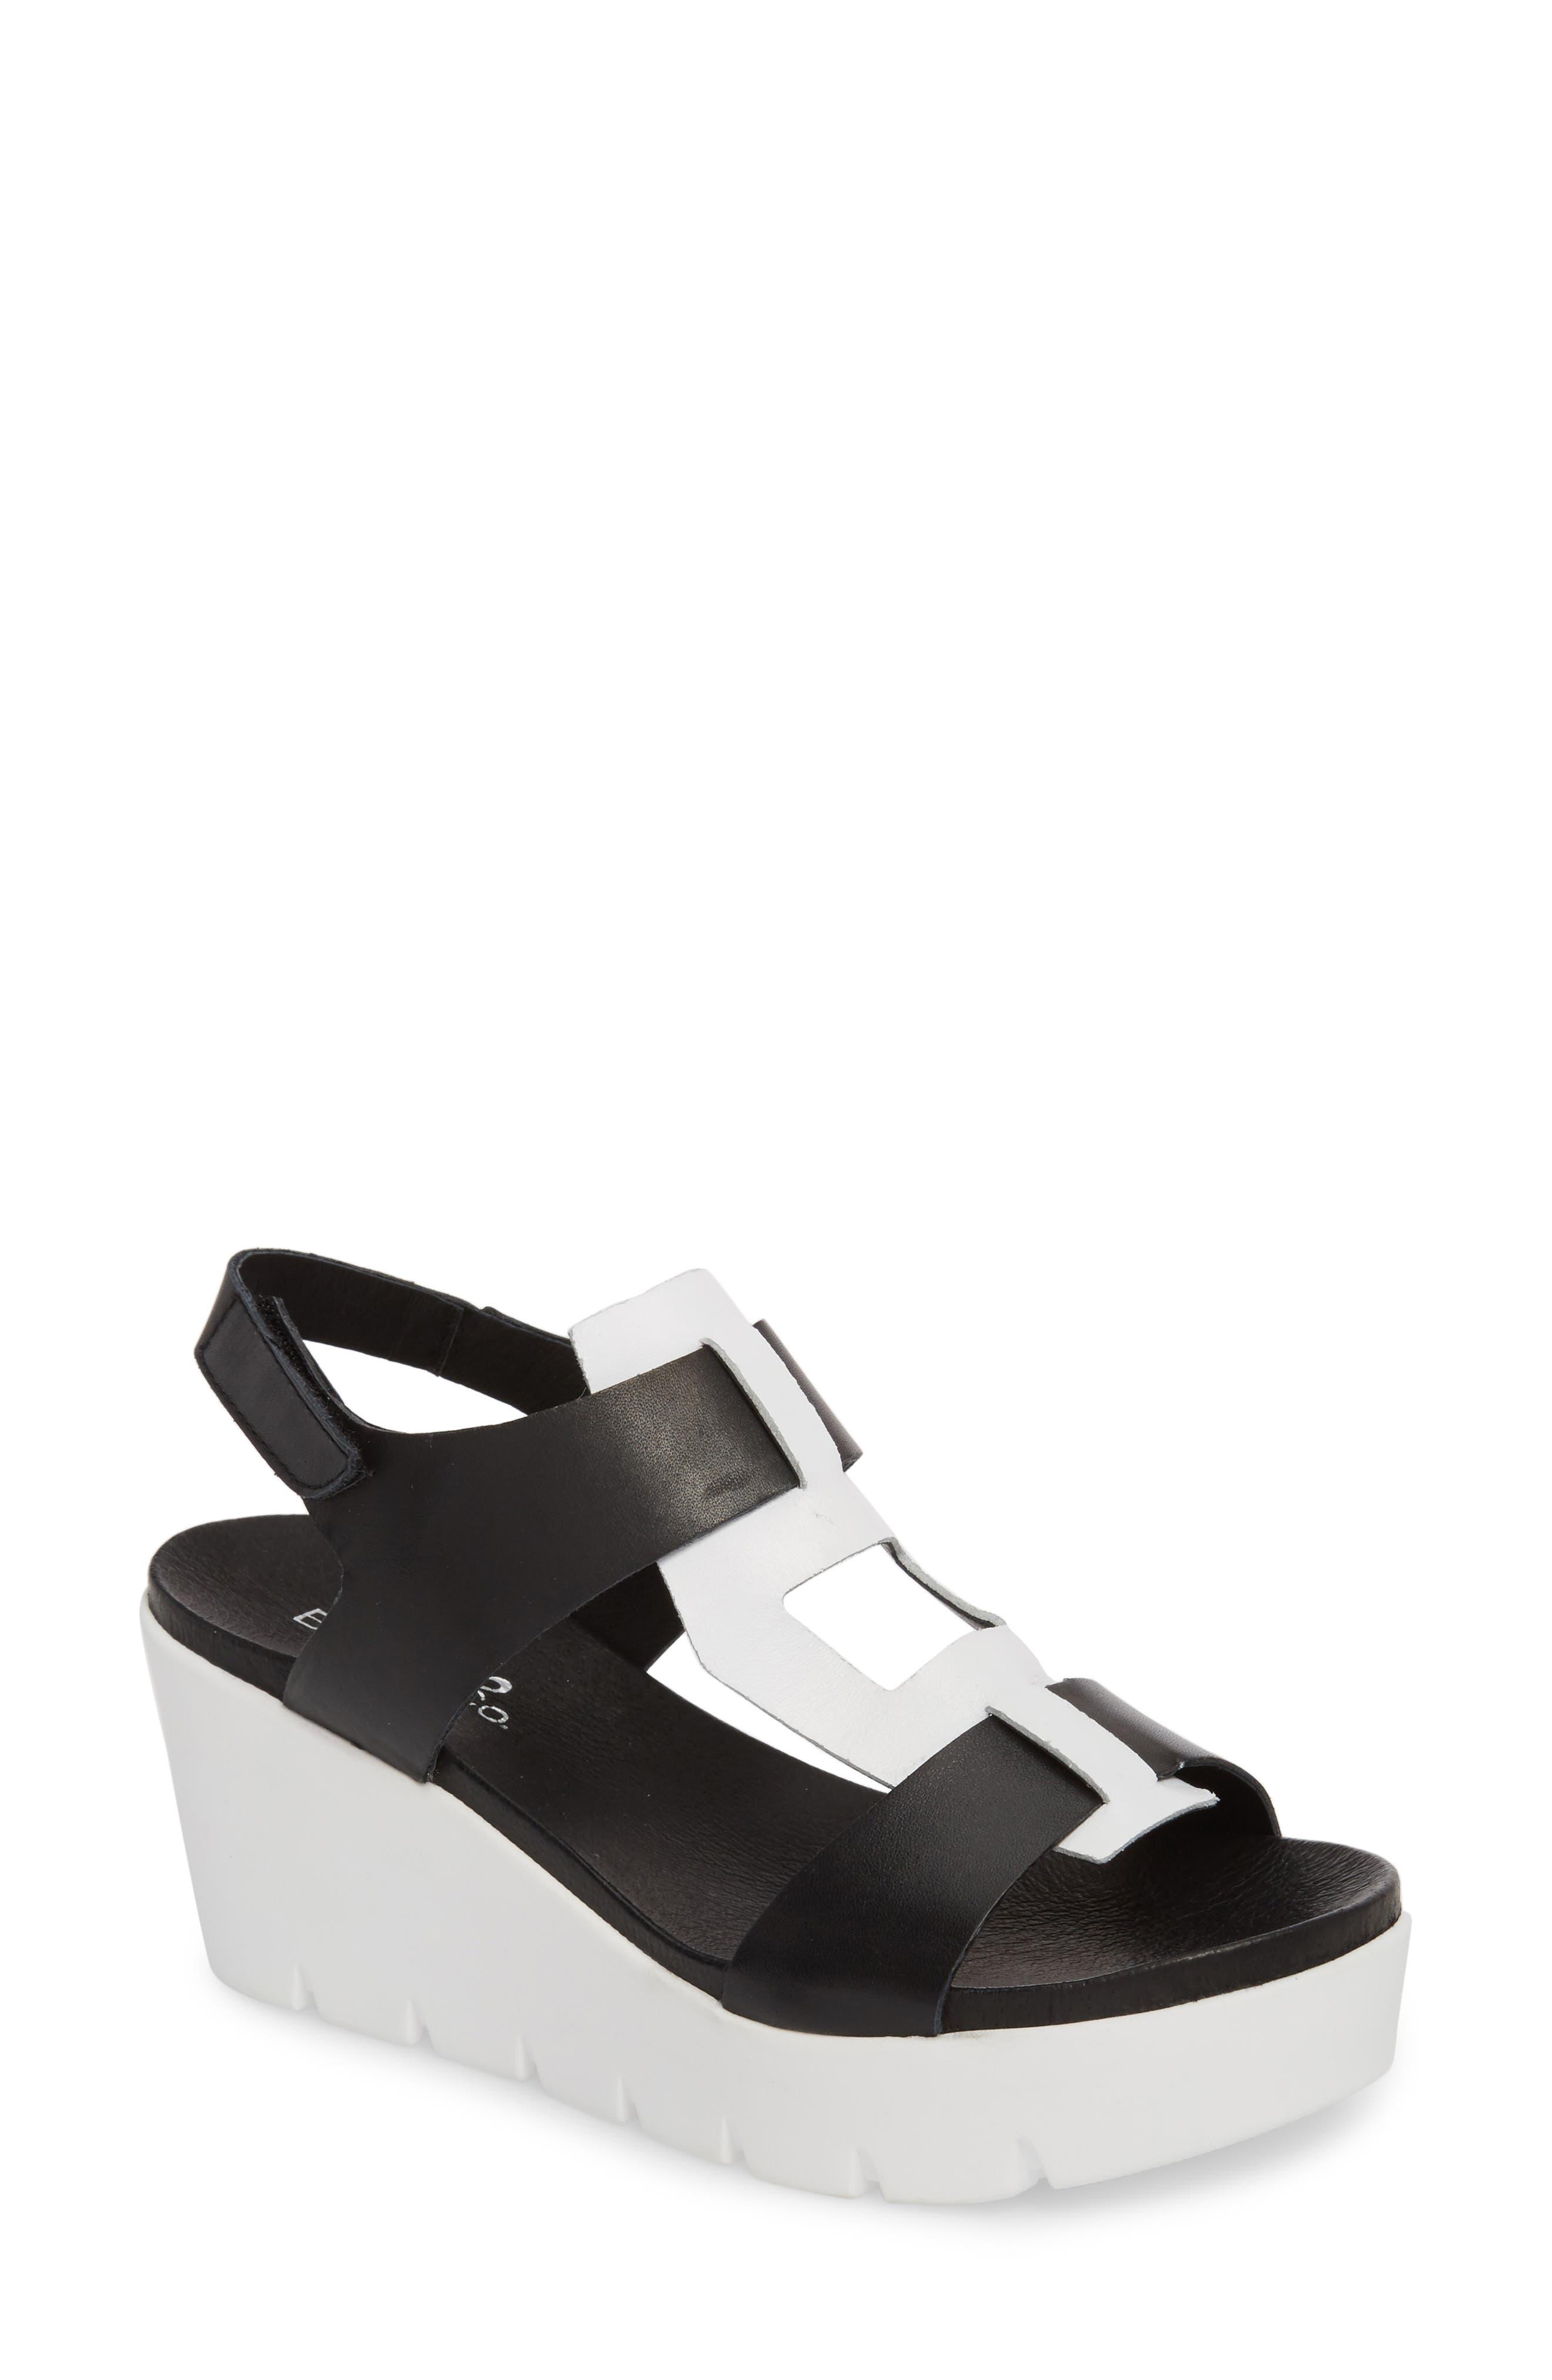 Bos. & Co. Somo Platform Wedge Sandal, Black